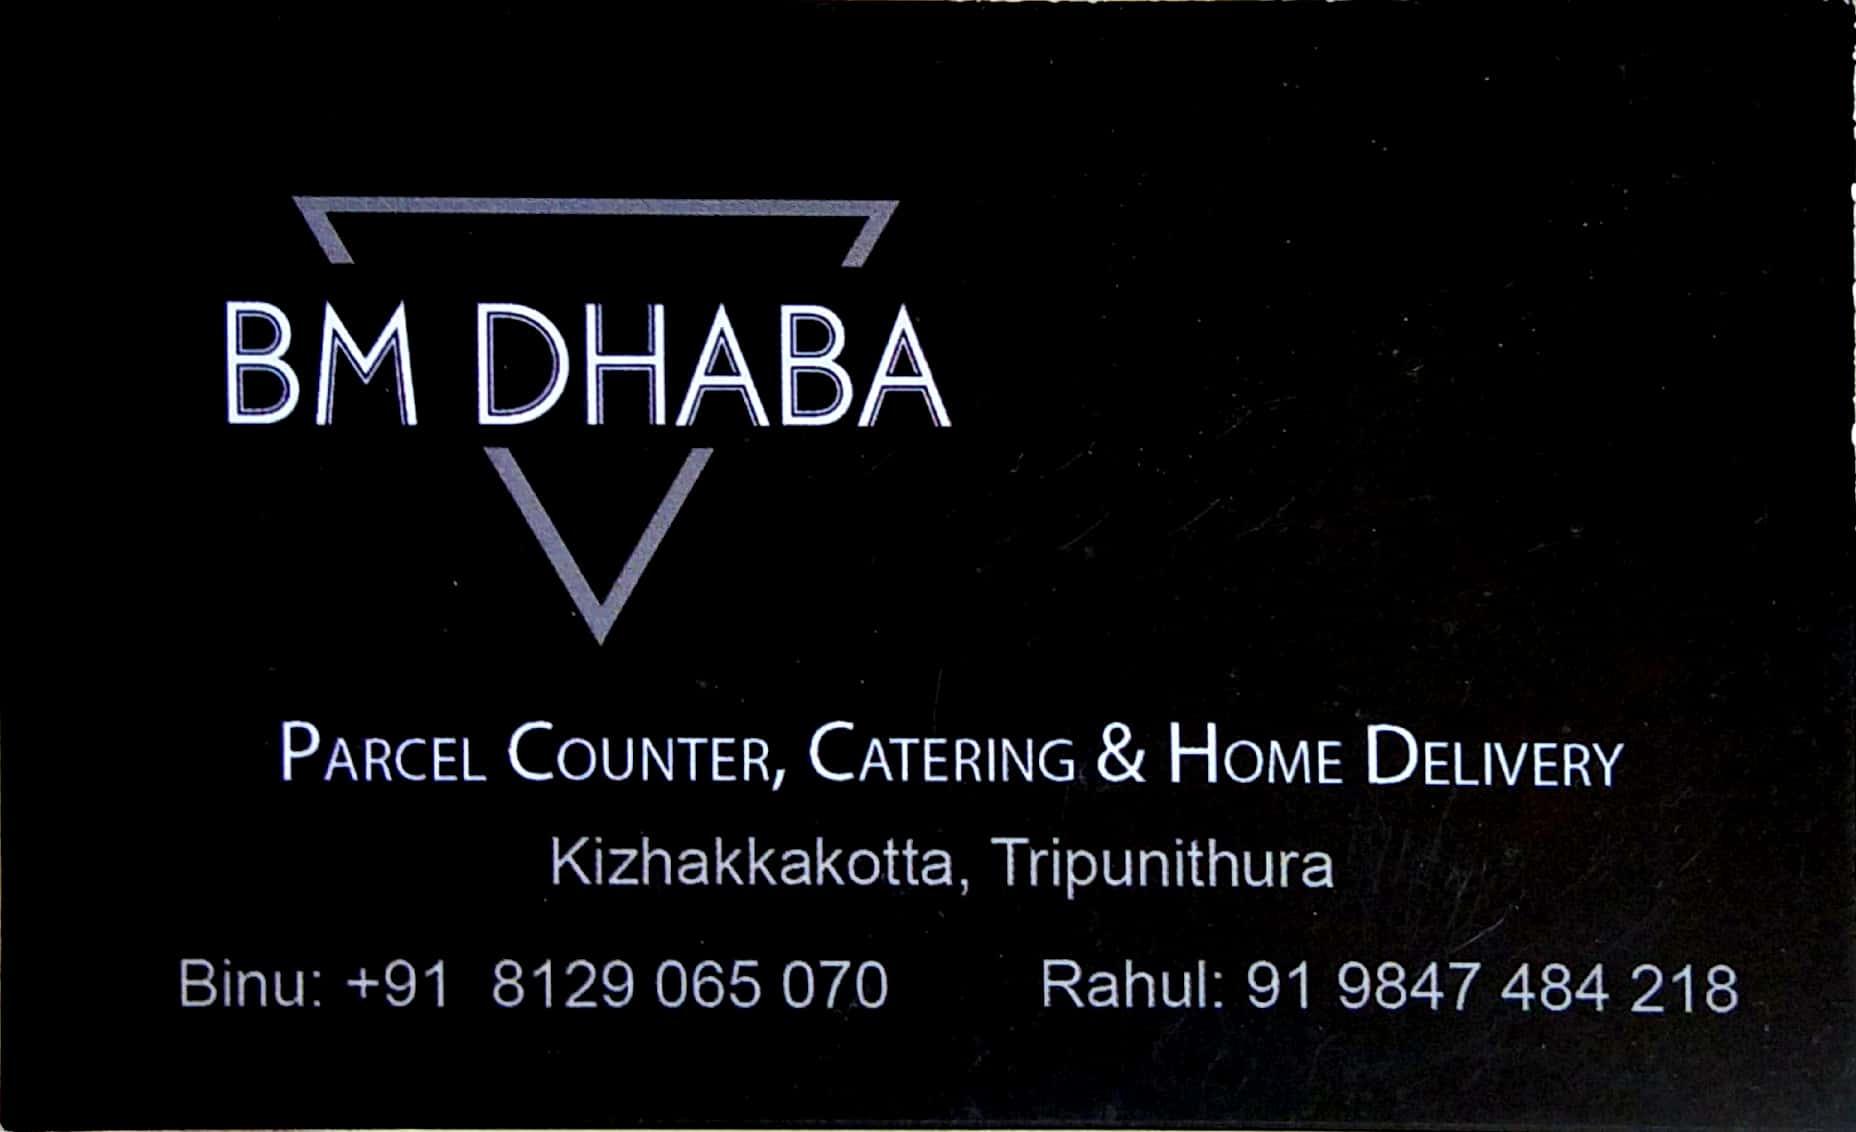 BM DHABA, FAST FOOD,  service in Thrippunithura, Ernakulam